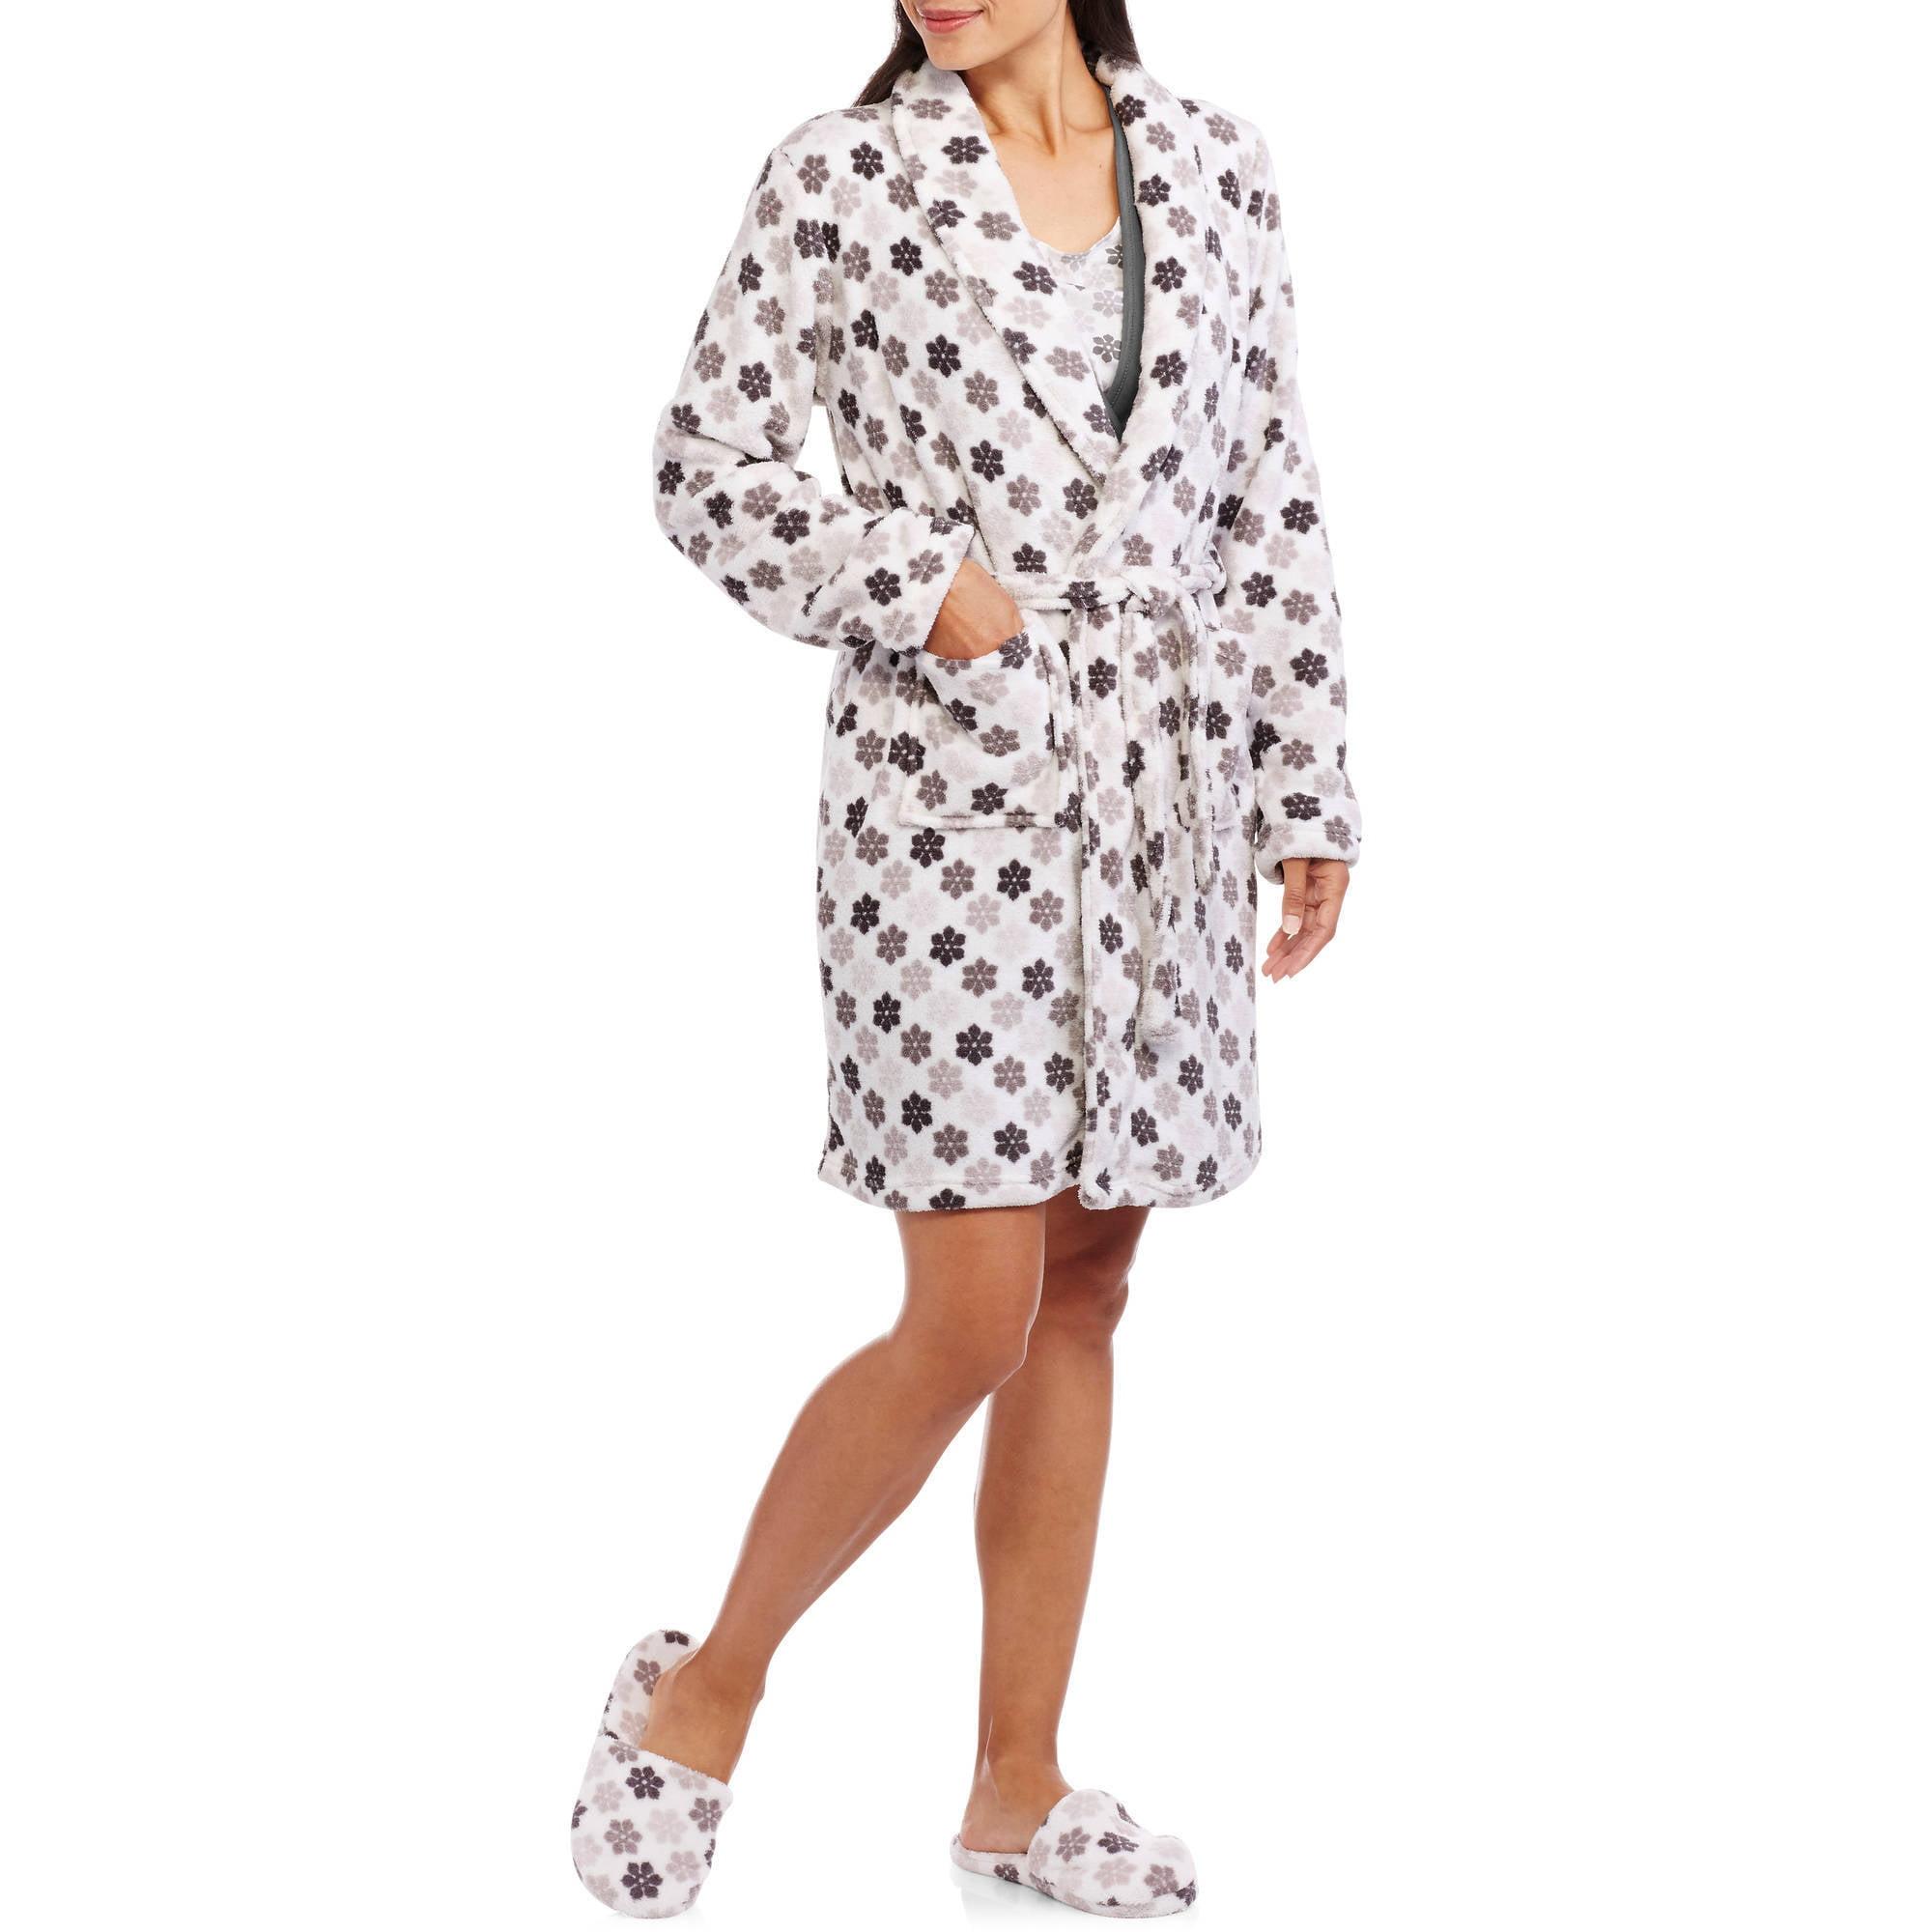 Maternity 3-Piece Nursing Chemise, Robe and Slippers Sleepwear Set ...